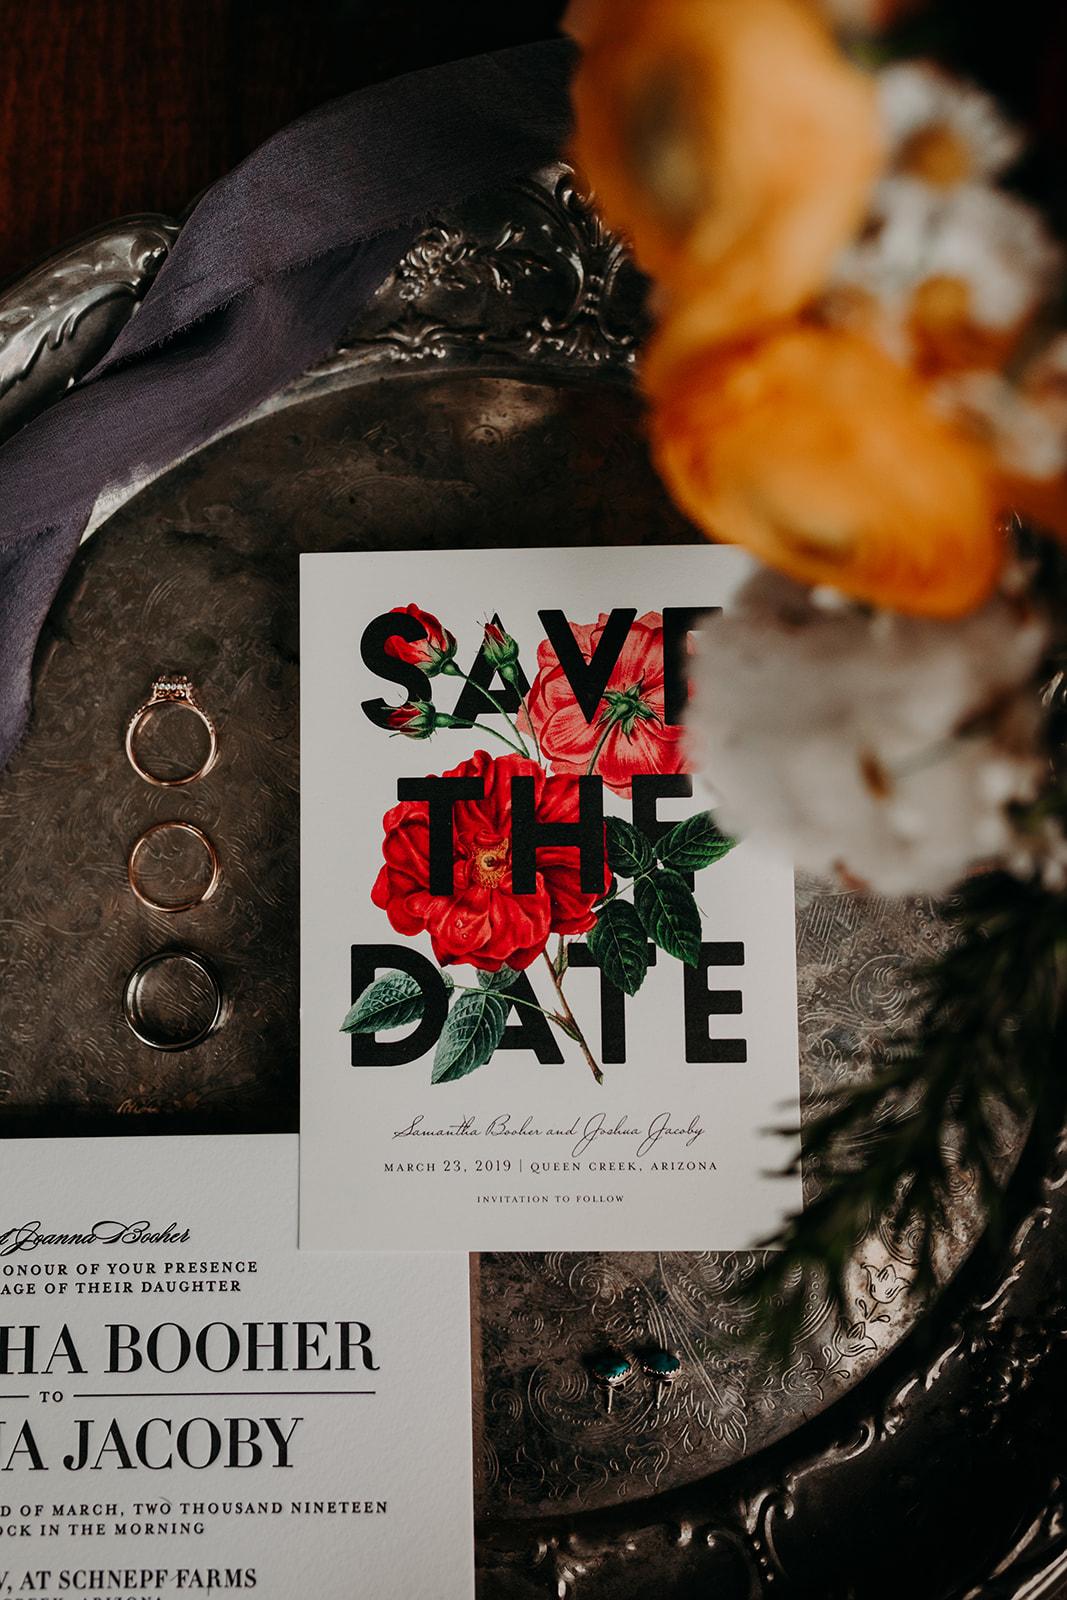 Disney Themed Wedding - Arizona florist Phoenix scottsdale Mesa chandler Sedona Flagstaff Prescott - Save the Date